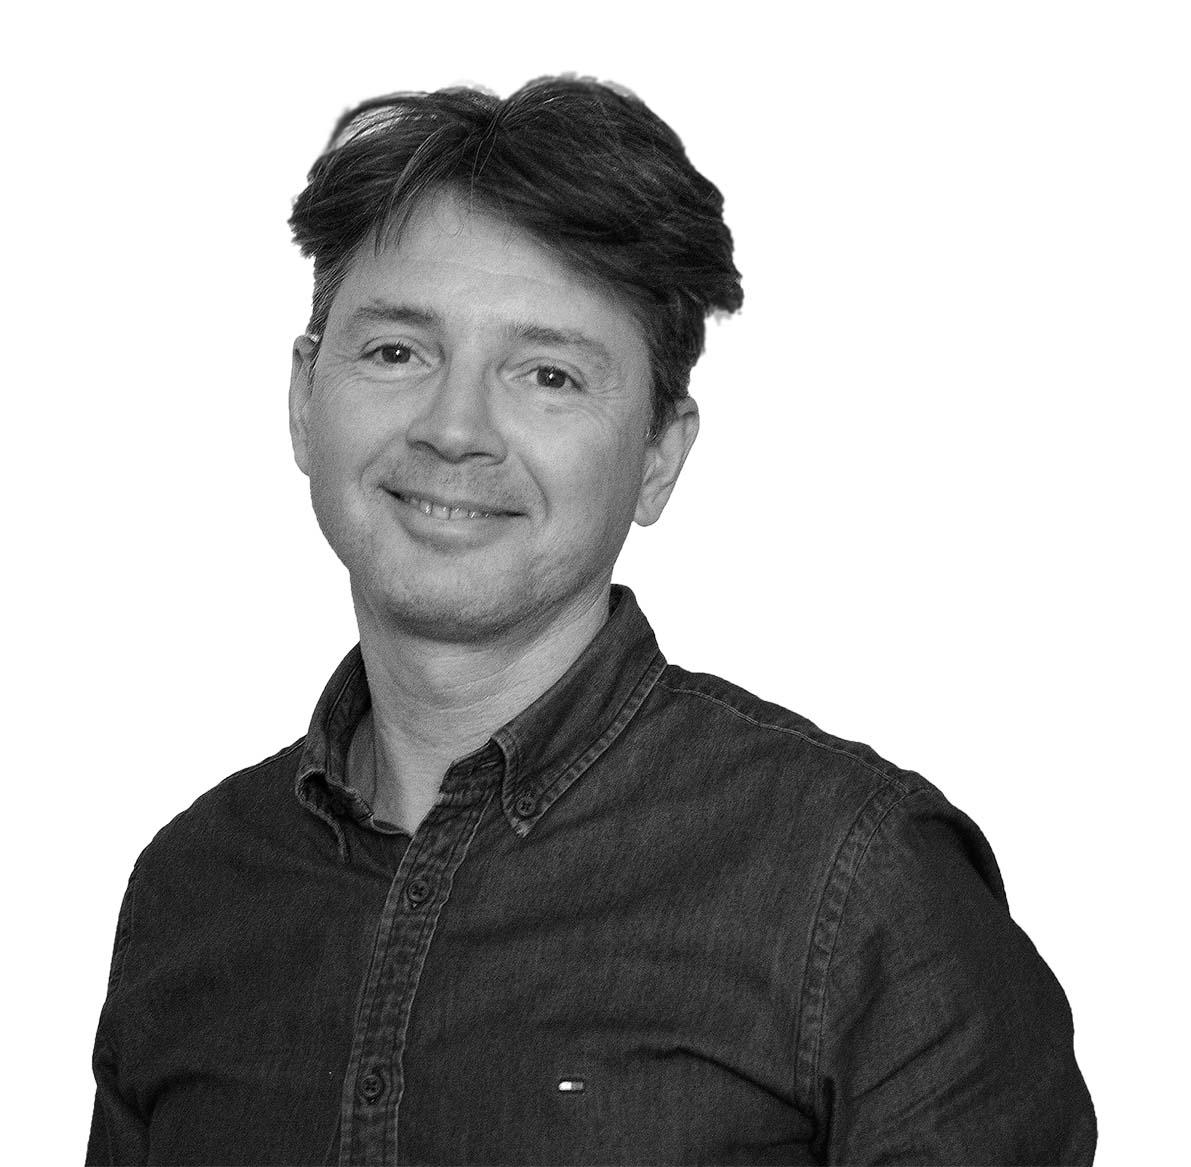 Geschäftsführer Elmar Neiger